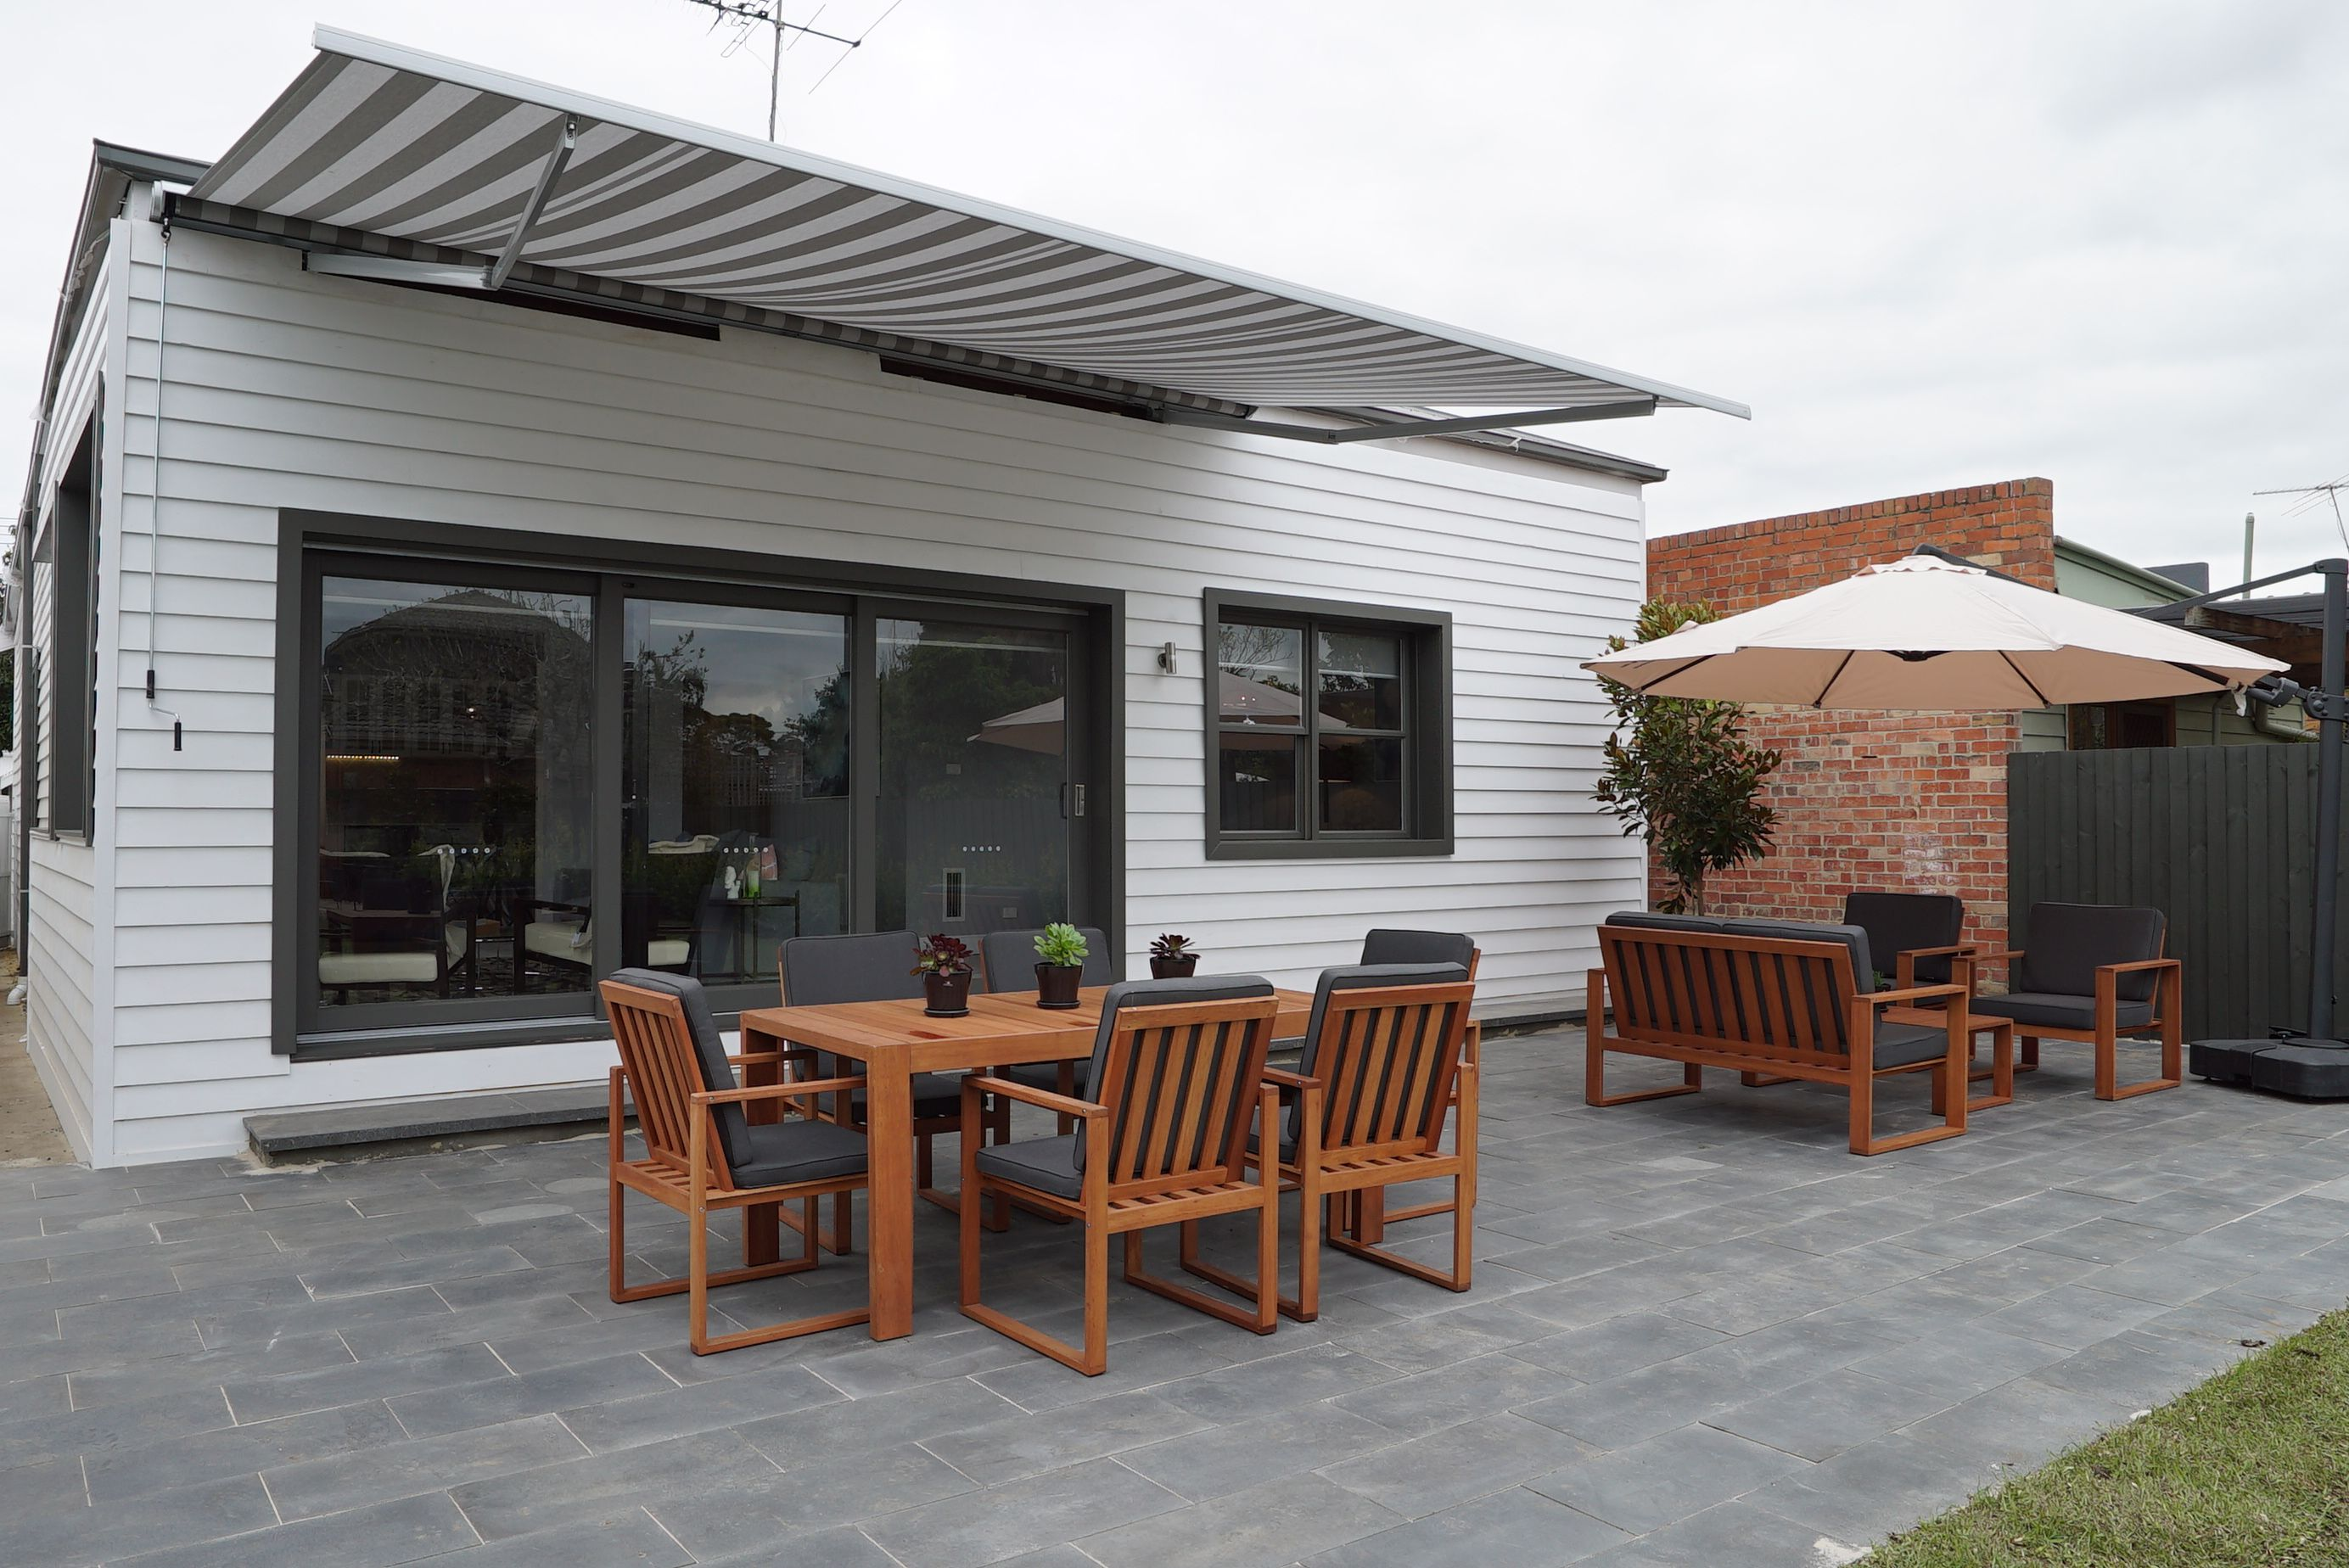 Pin On The Best Of Selling Houses Australia Season 9